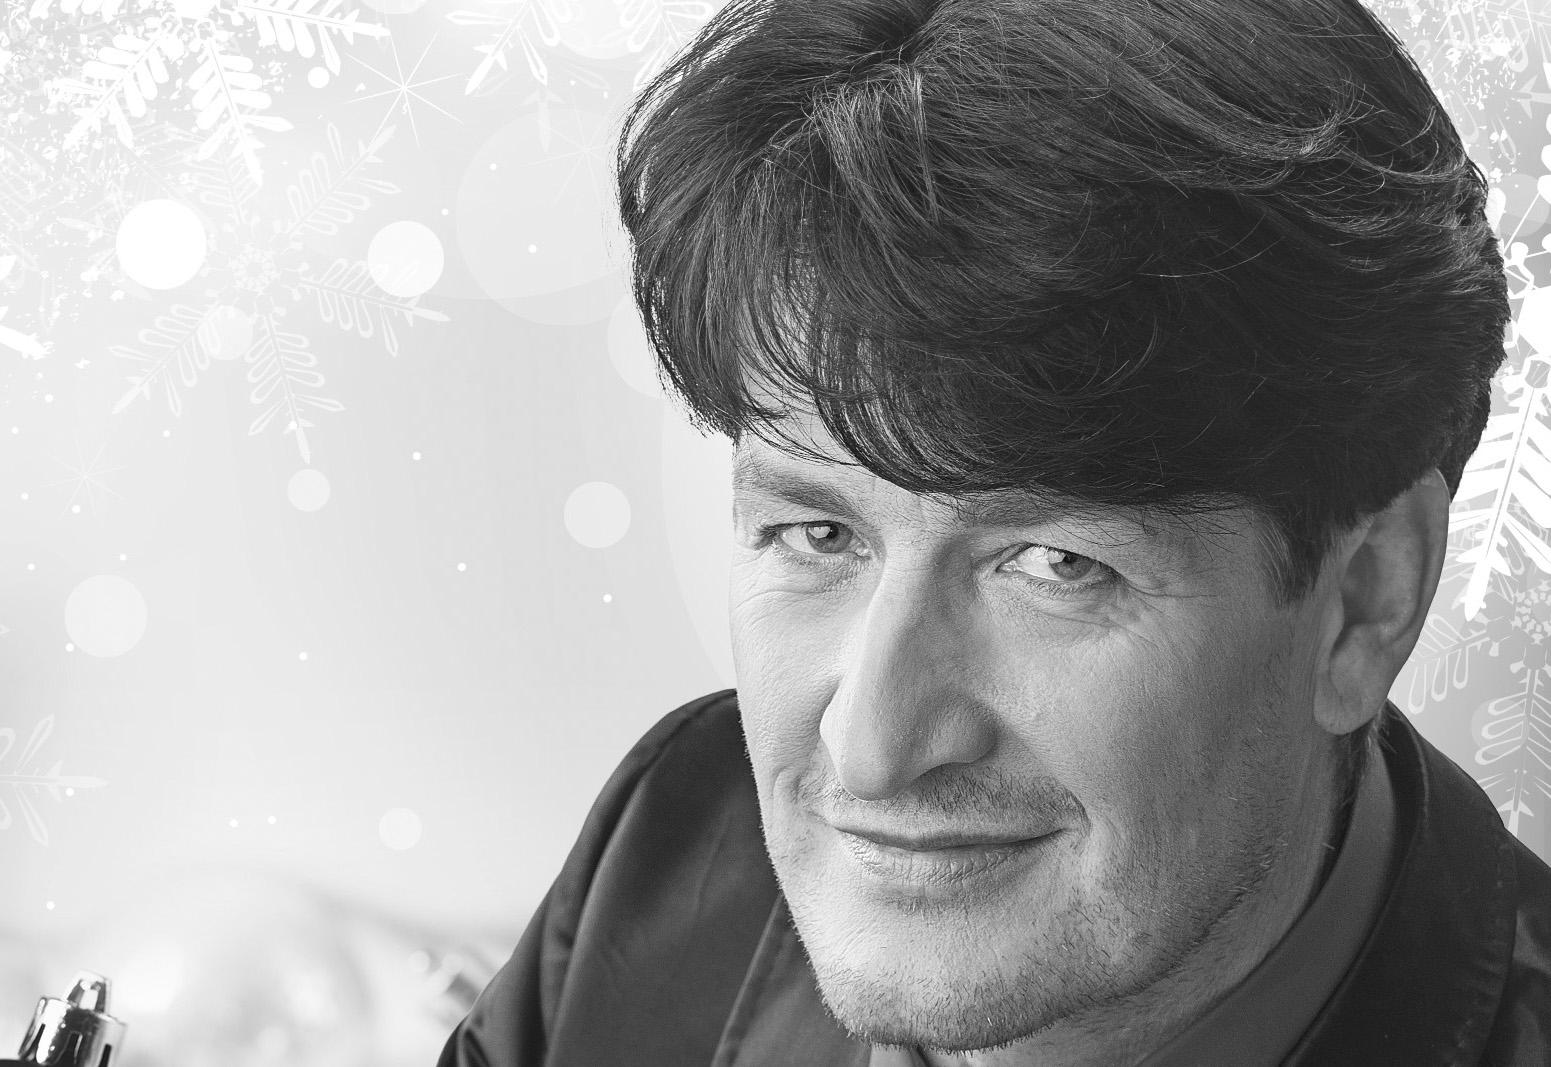 Andreas Fulterer Abschiedsbrief andreas fulterer – der abschiedsbrief an seine fans